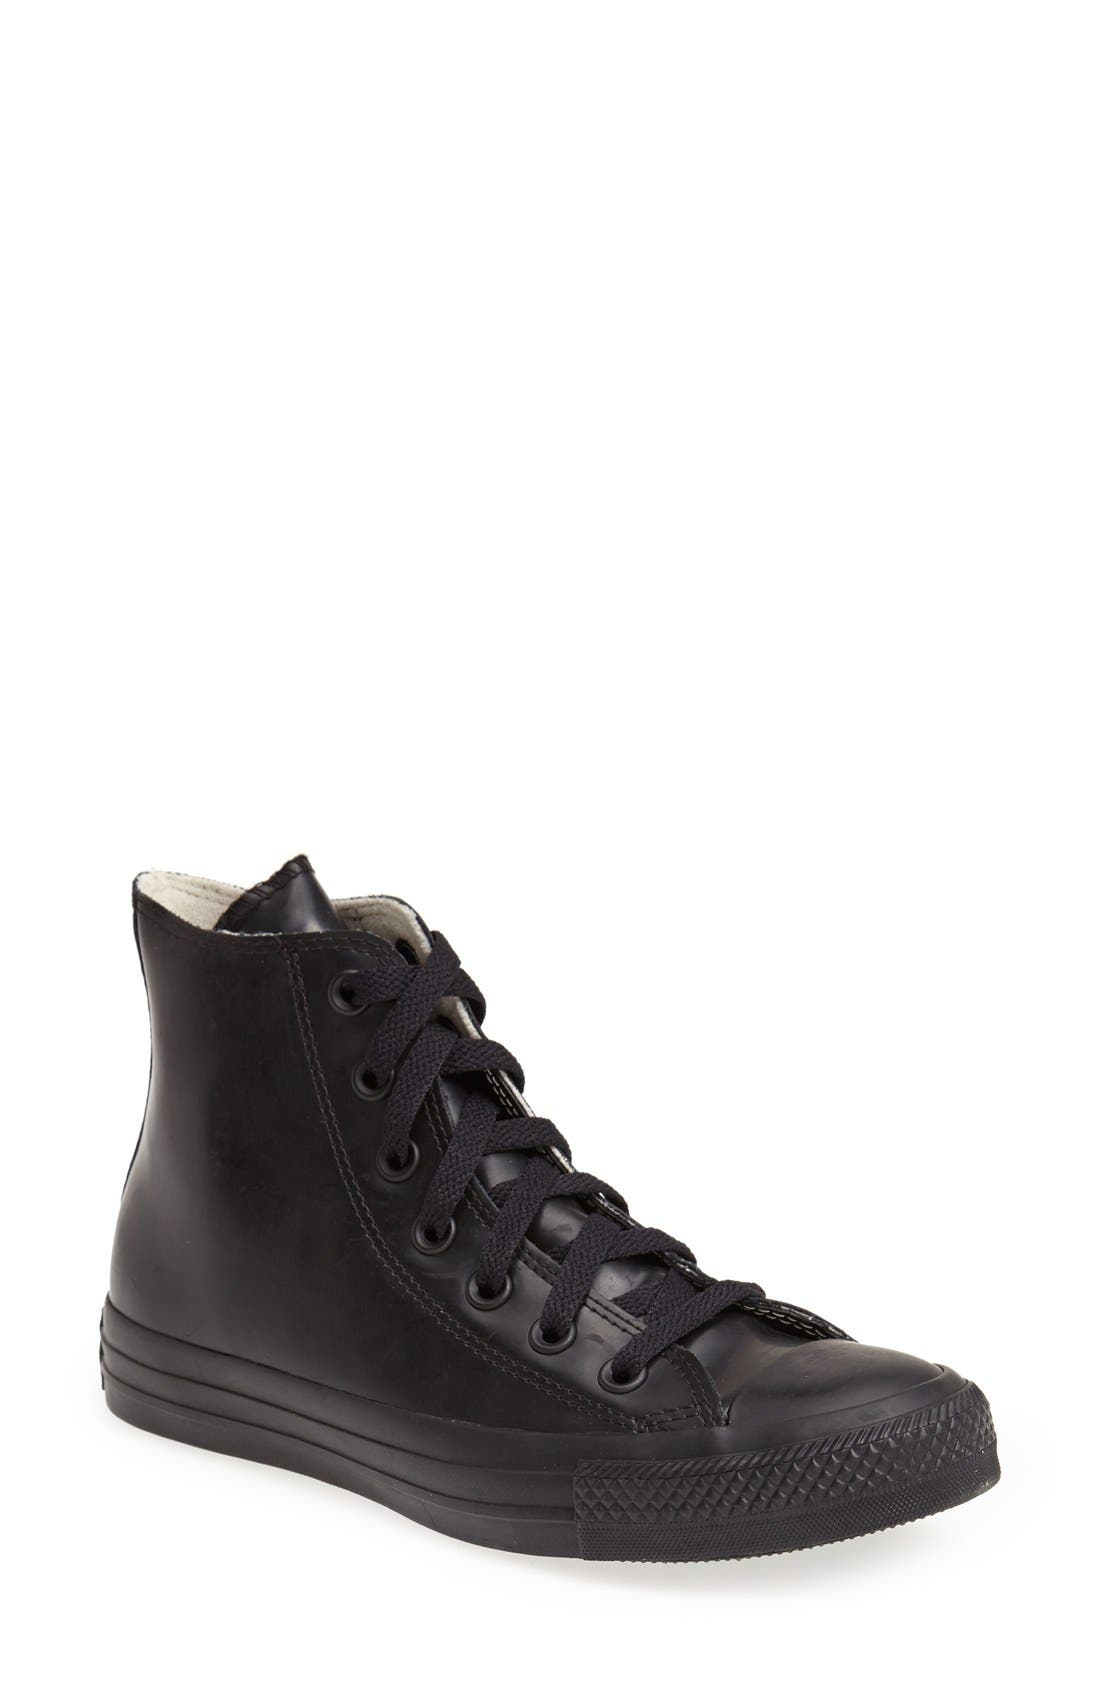 Alternate Image 1 Selected - Chuck Taylor® All Star® Waterproof Rubber Rain Sneaker (Women)